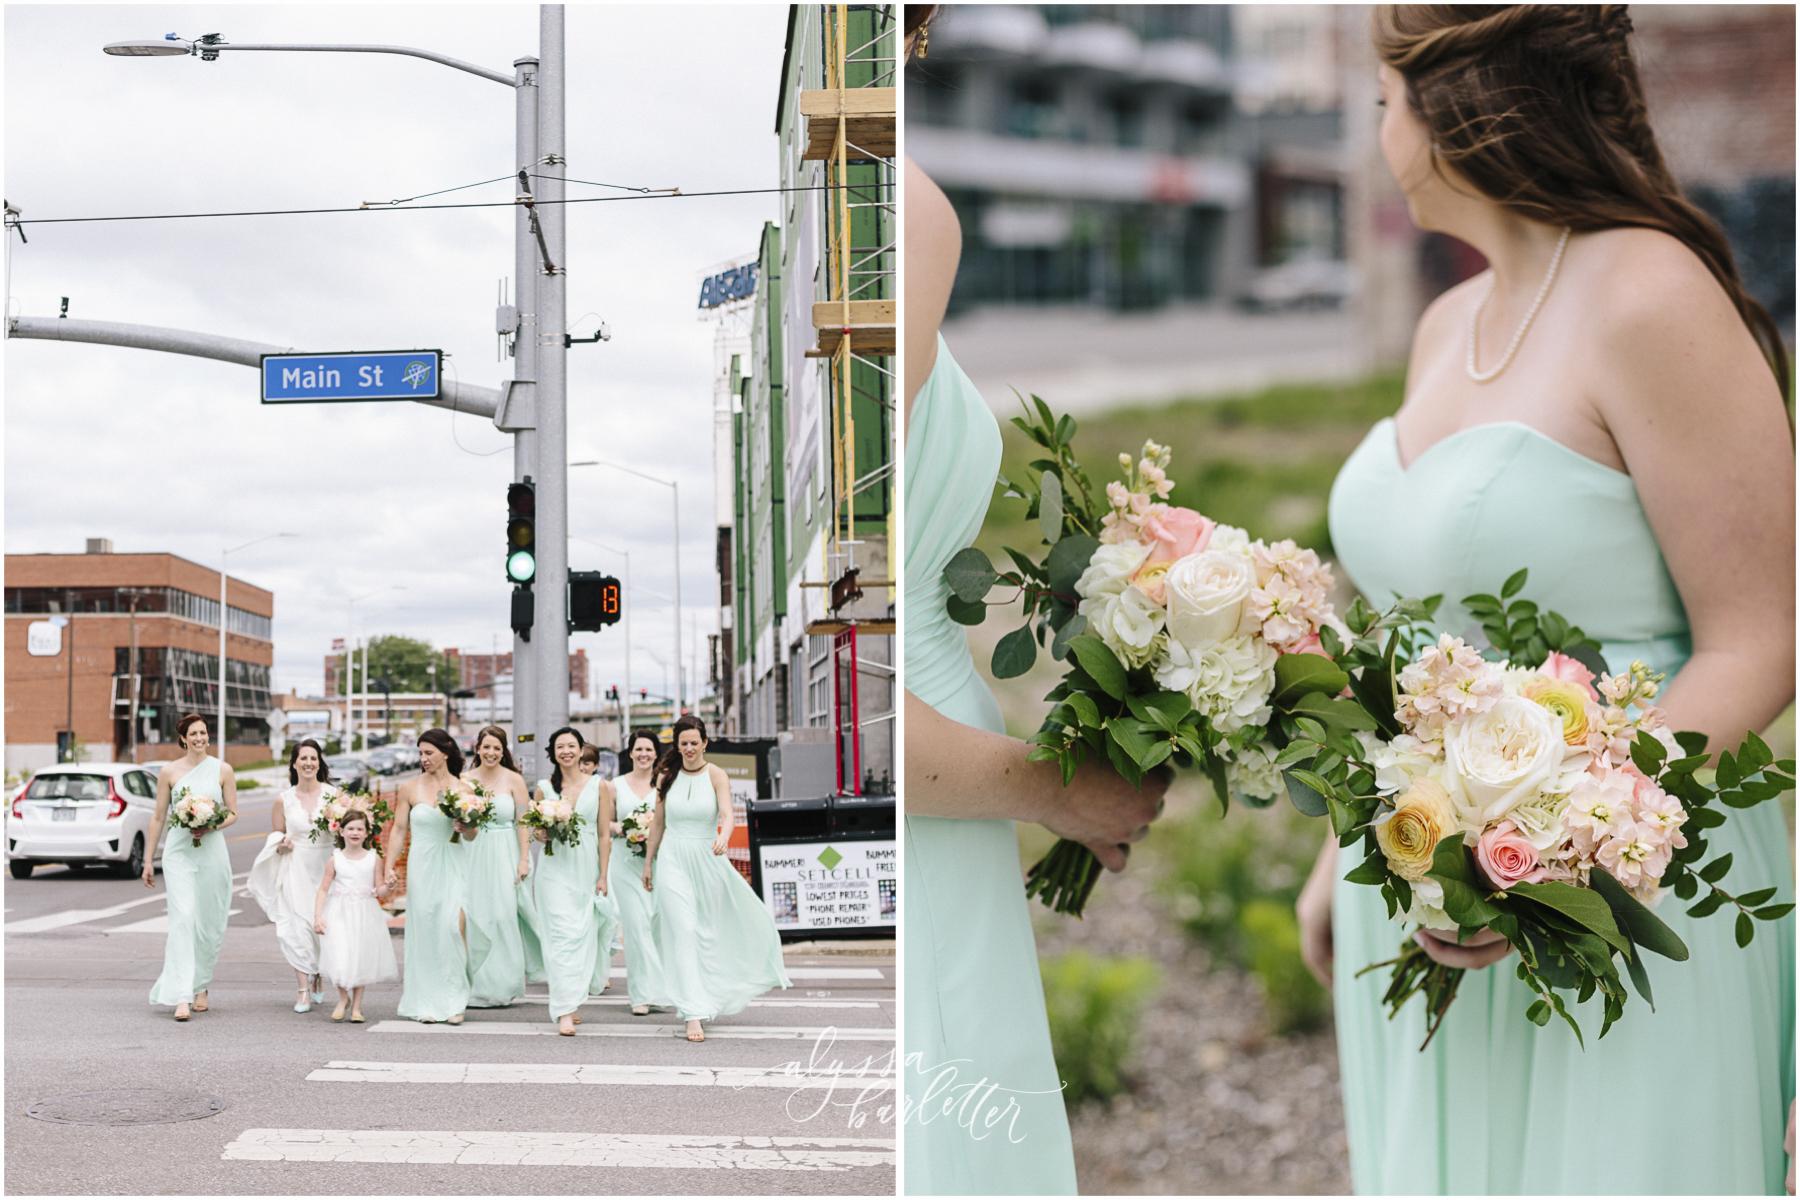 alyssa barletter photography kansas city wedding 2016 main courtney and brian-1-25.jpg